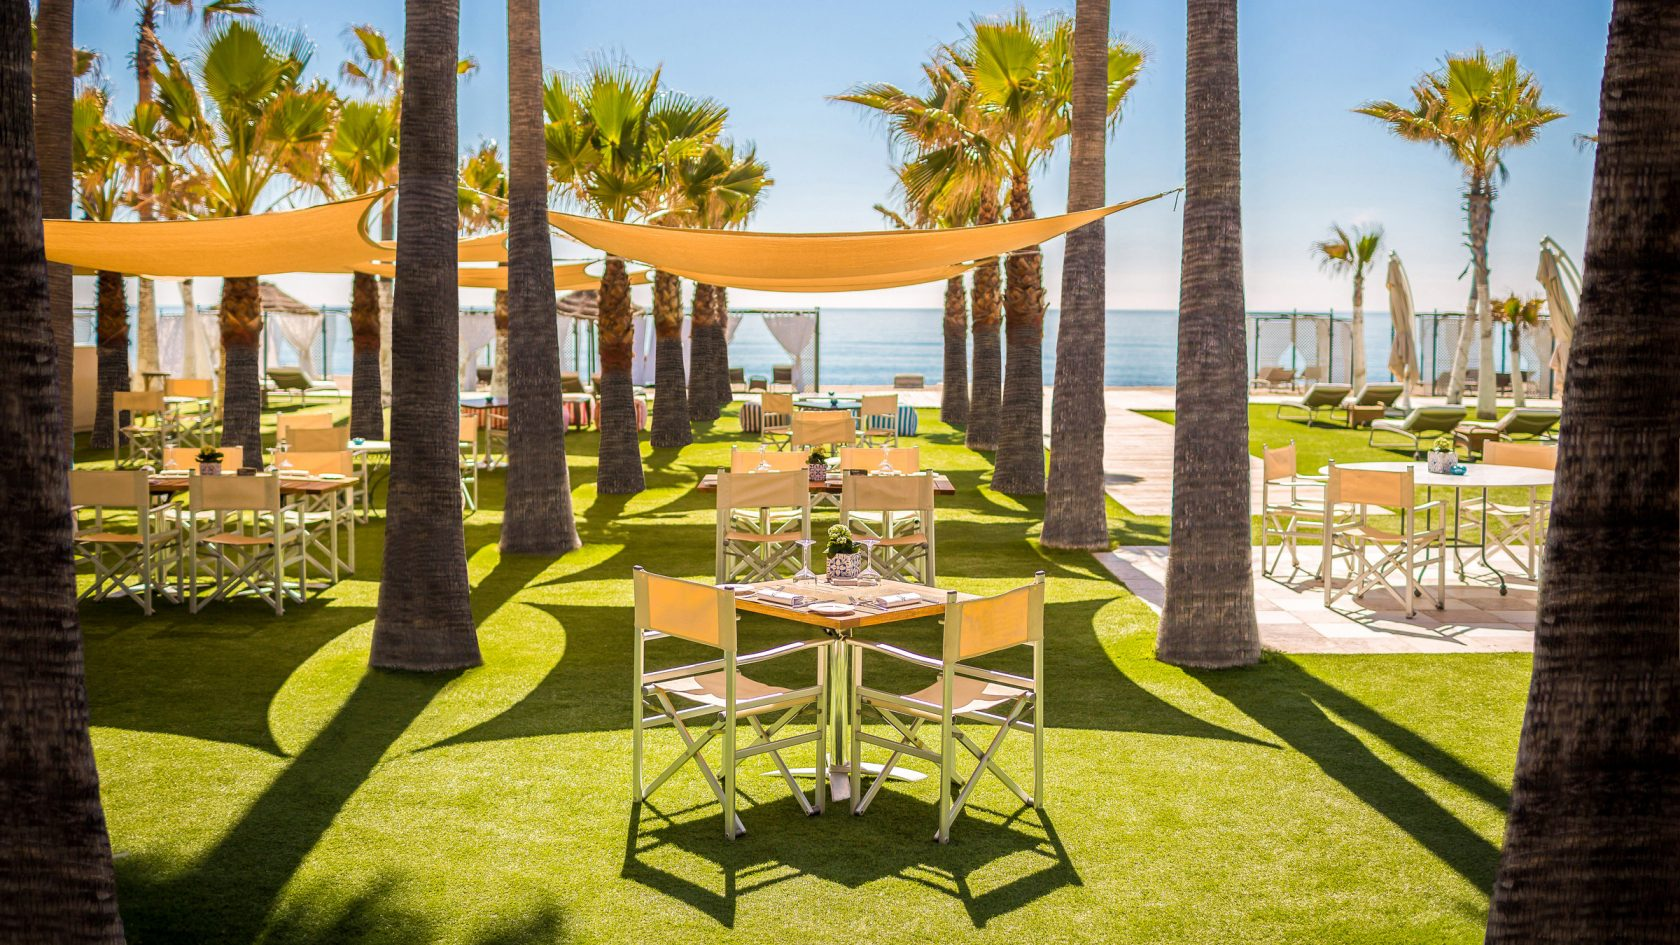 Anantara Villa Padierna Palace Benahavís Marbella Resort / Marbella, Spanien